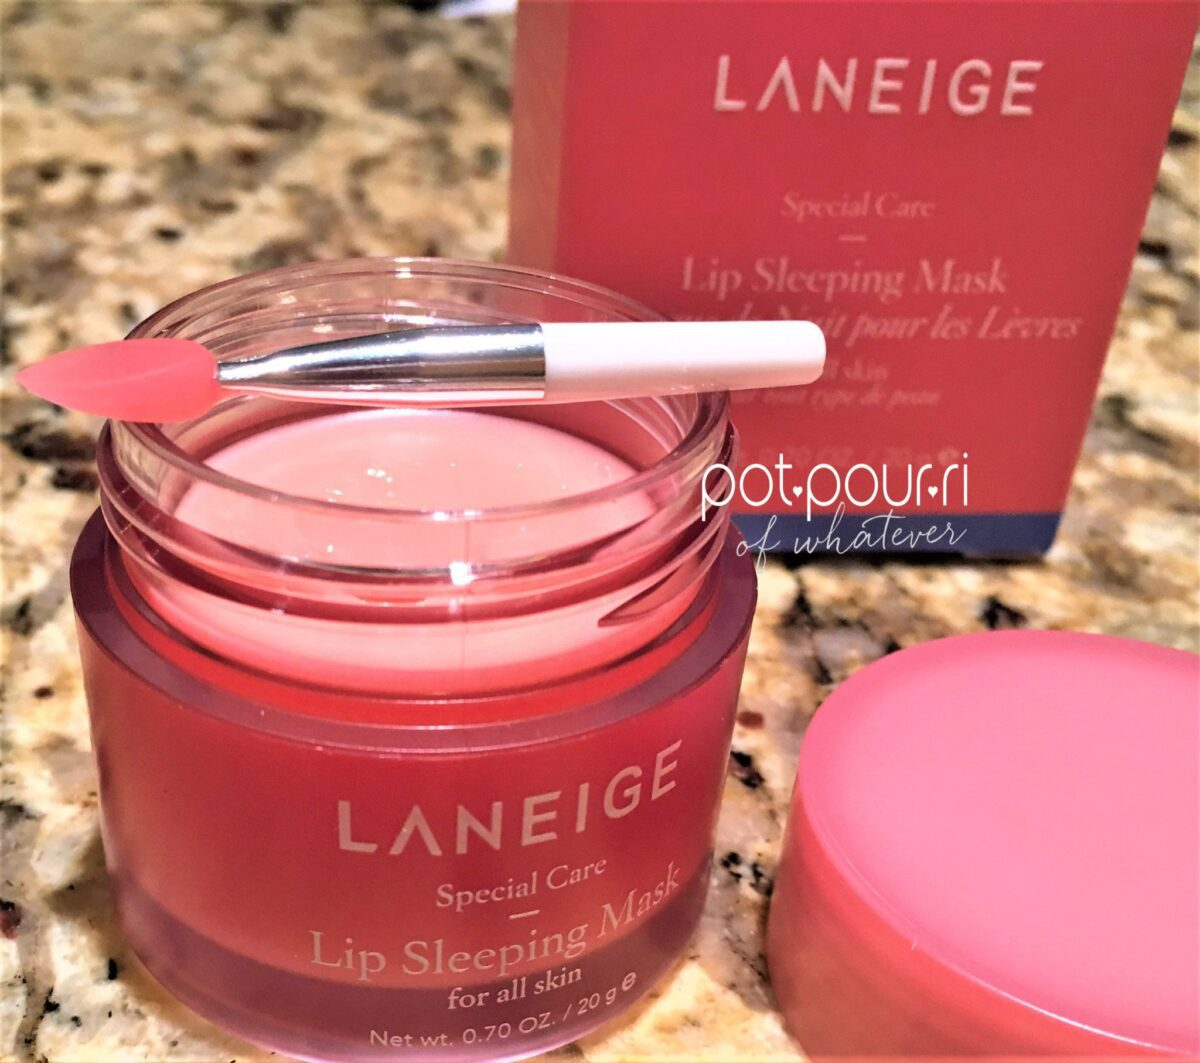 Laneige Lip Sleeping Mask Packaging box, jar and applicator wand